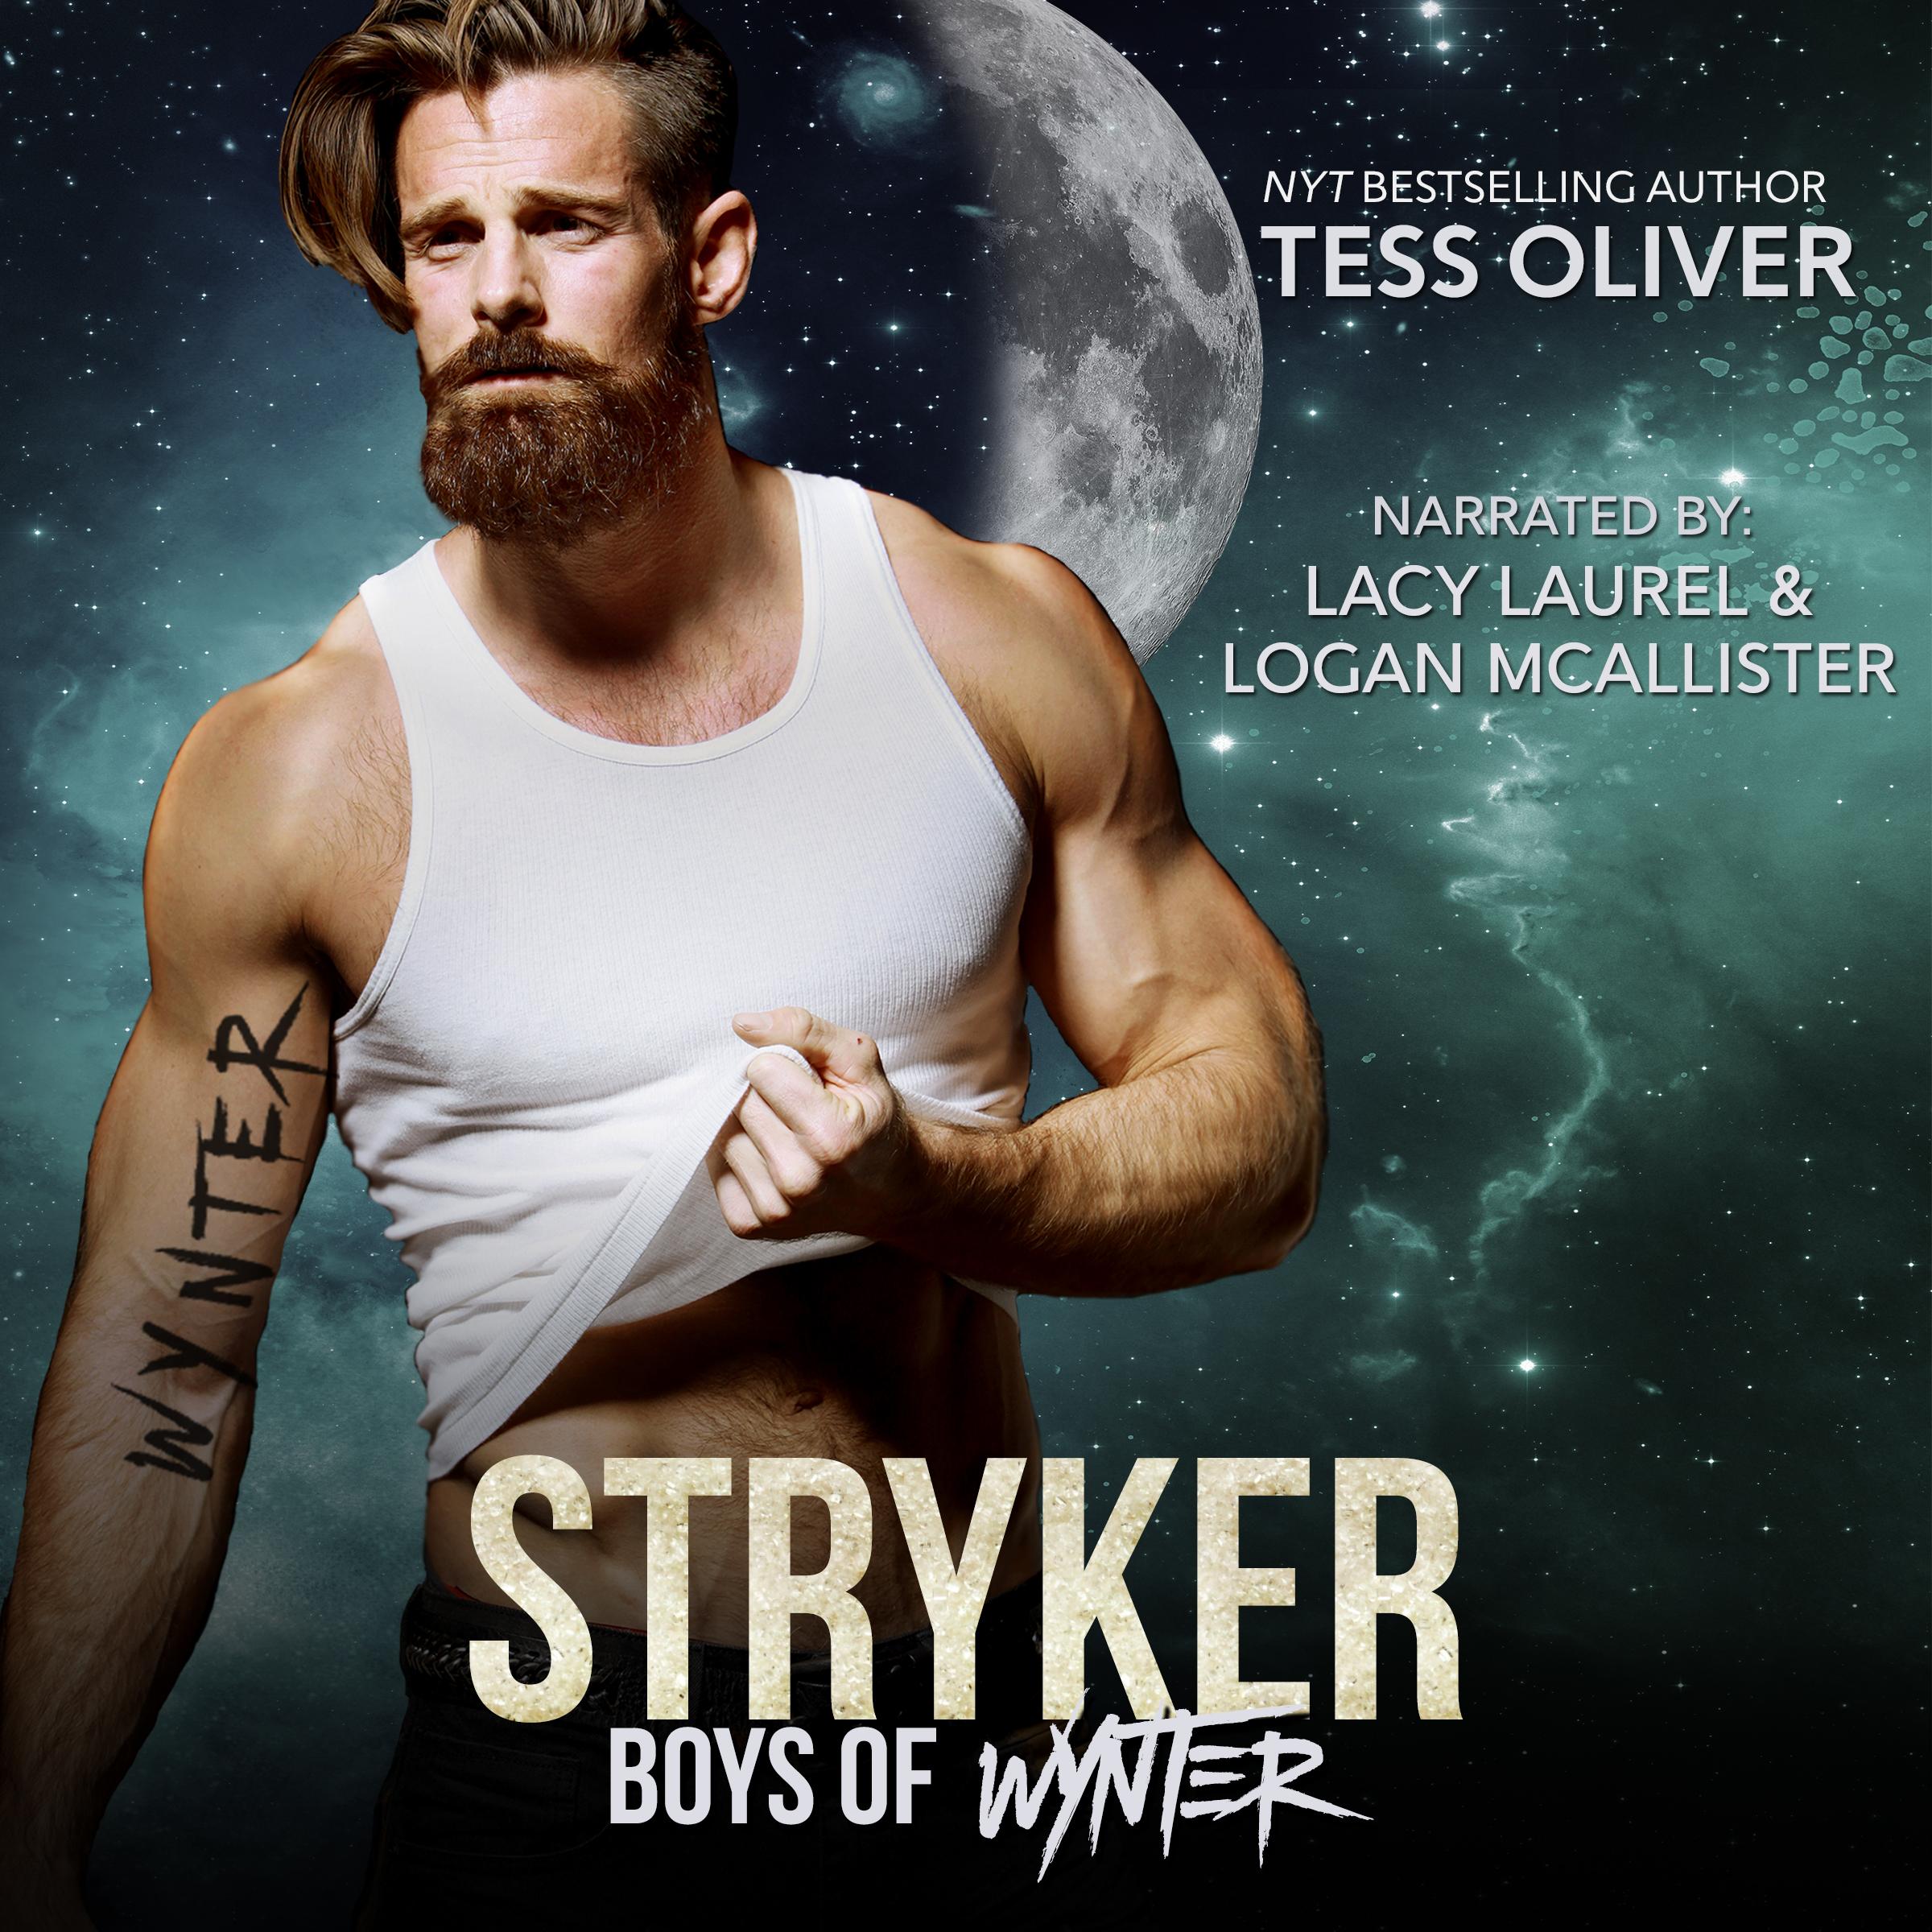 stryker_audio_cover.jpg